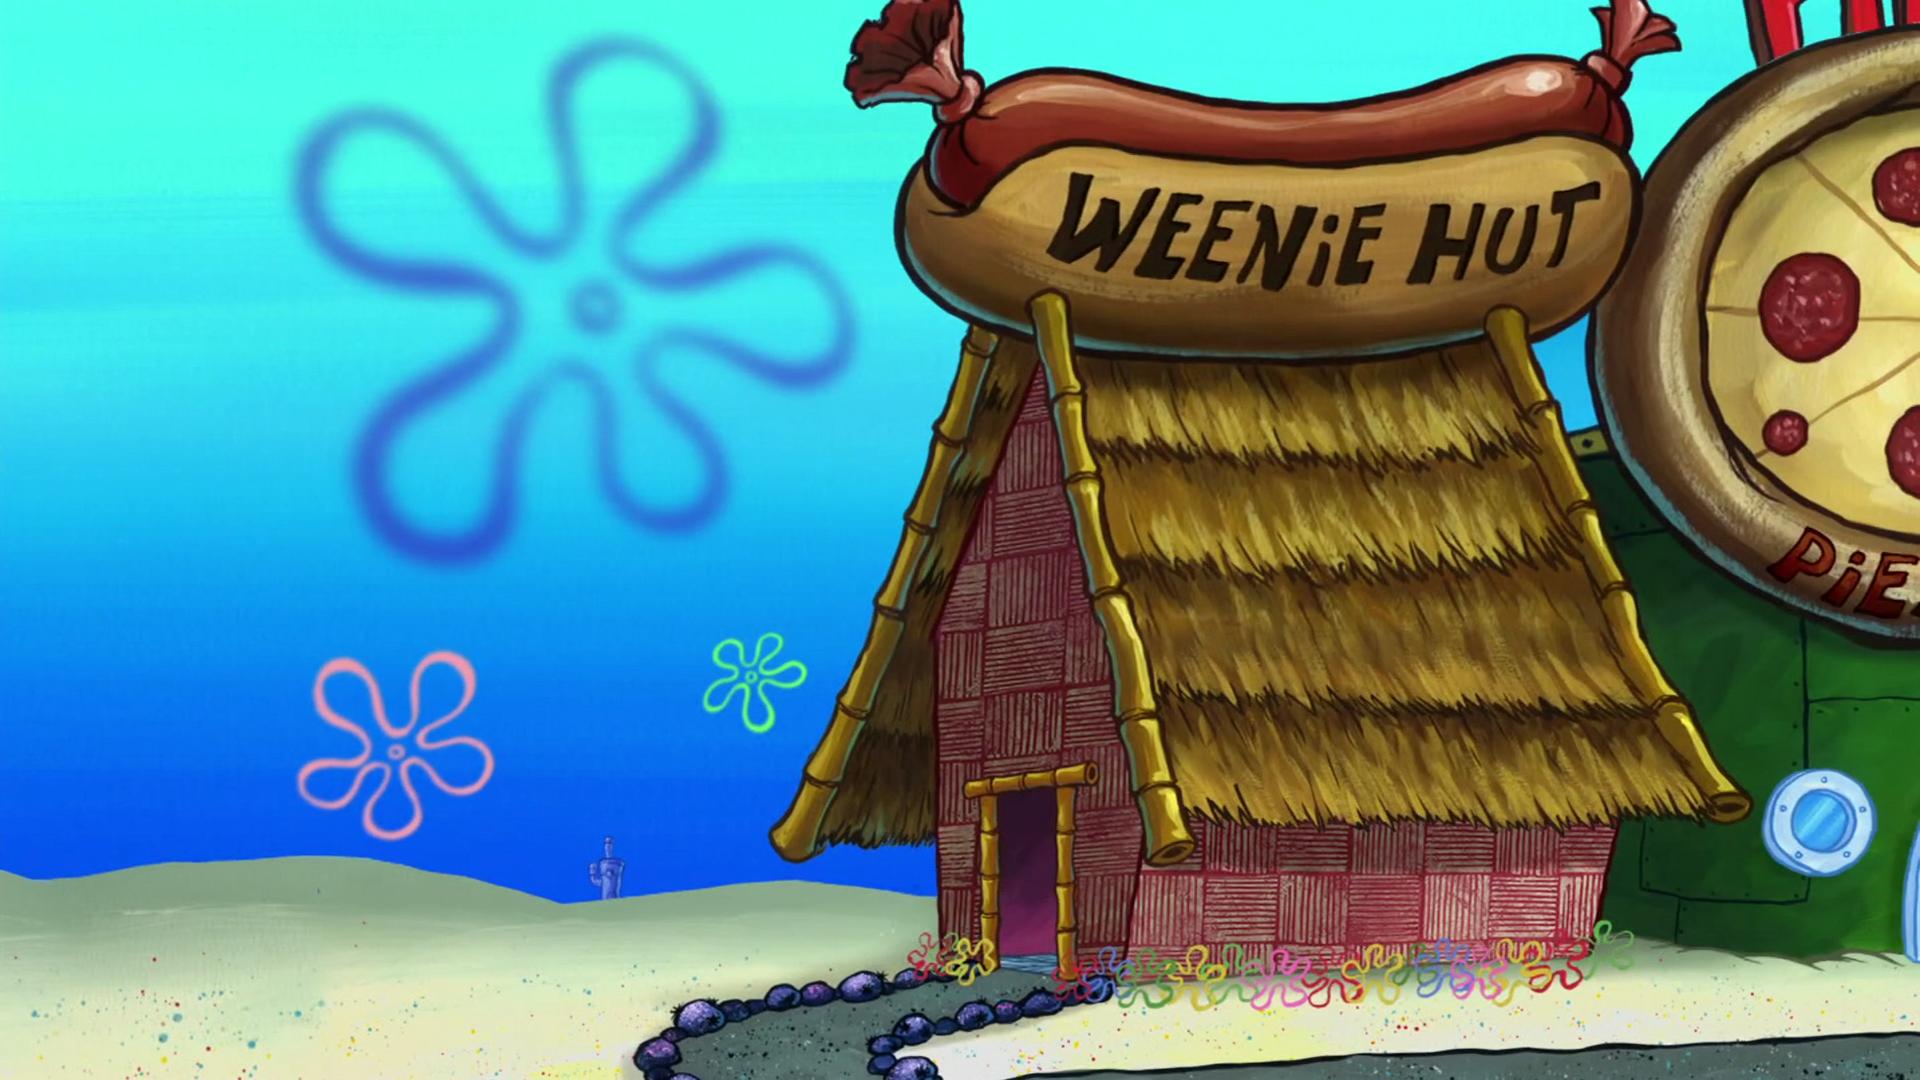 His first massive weenie